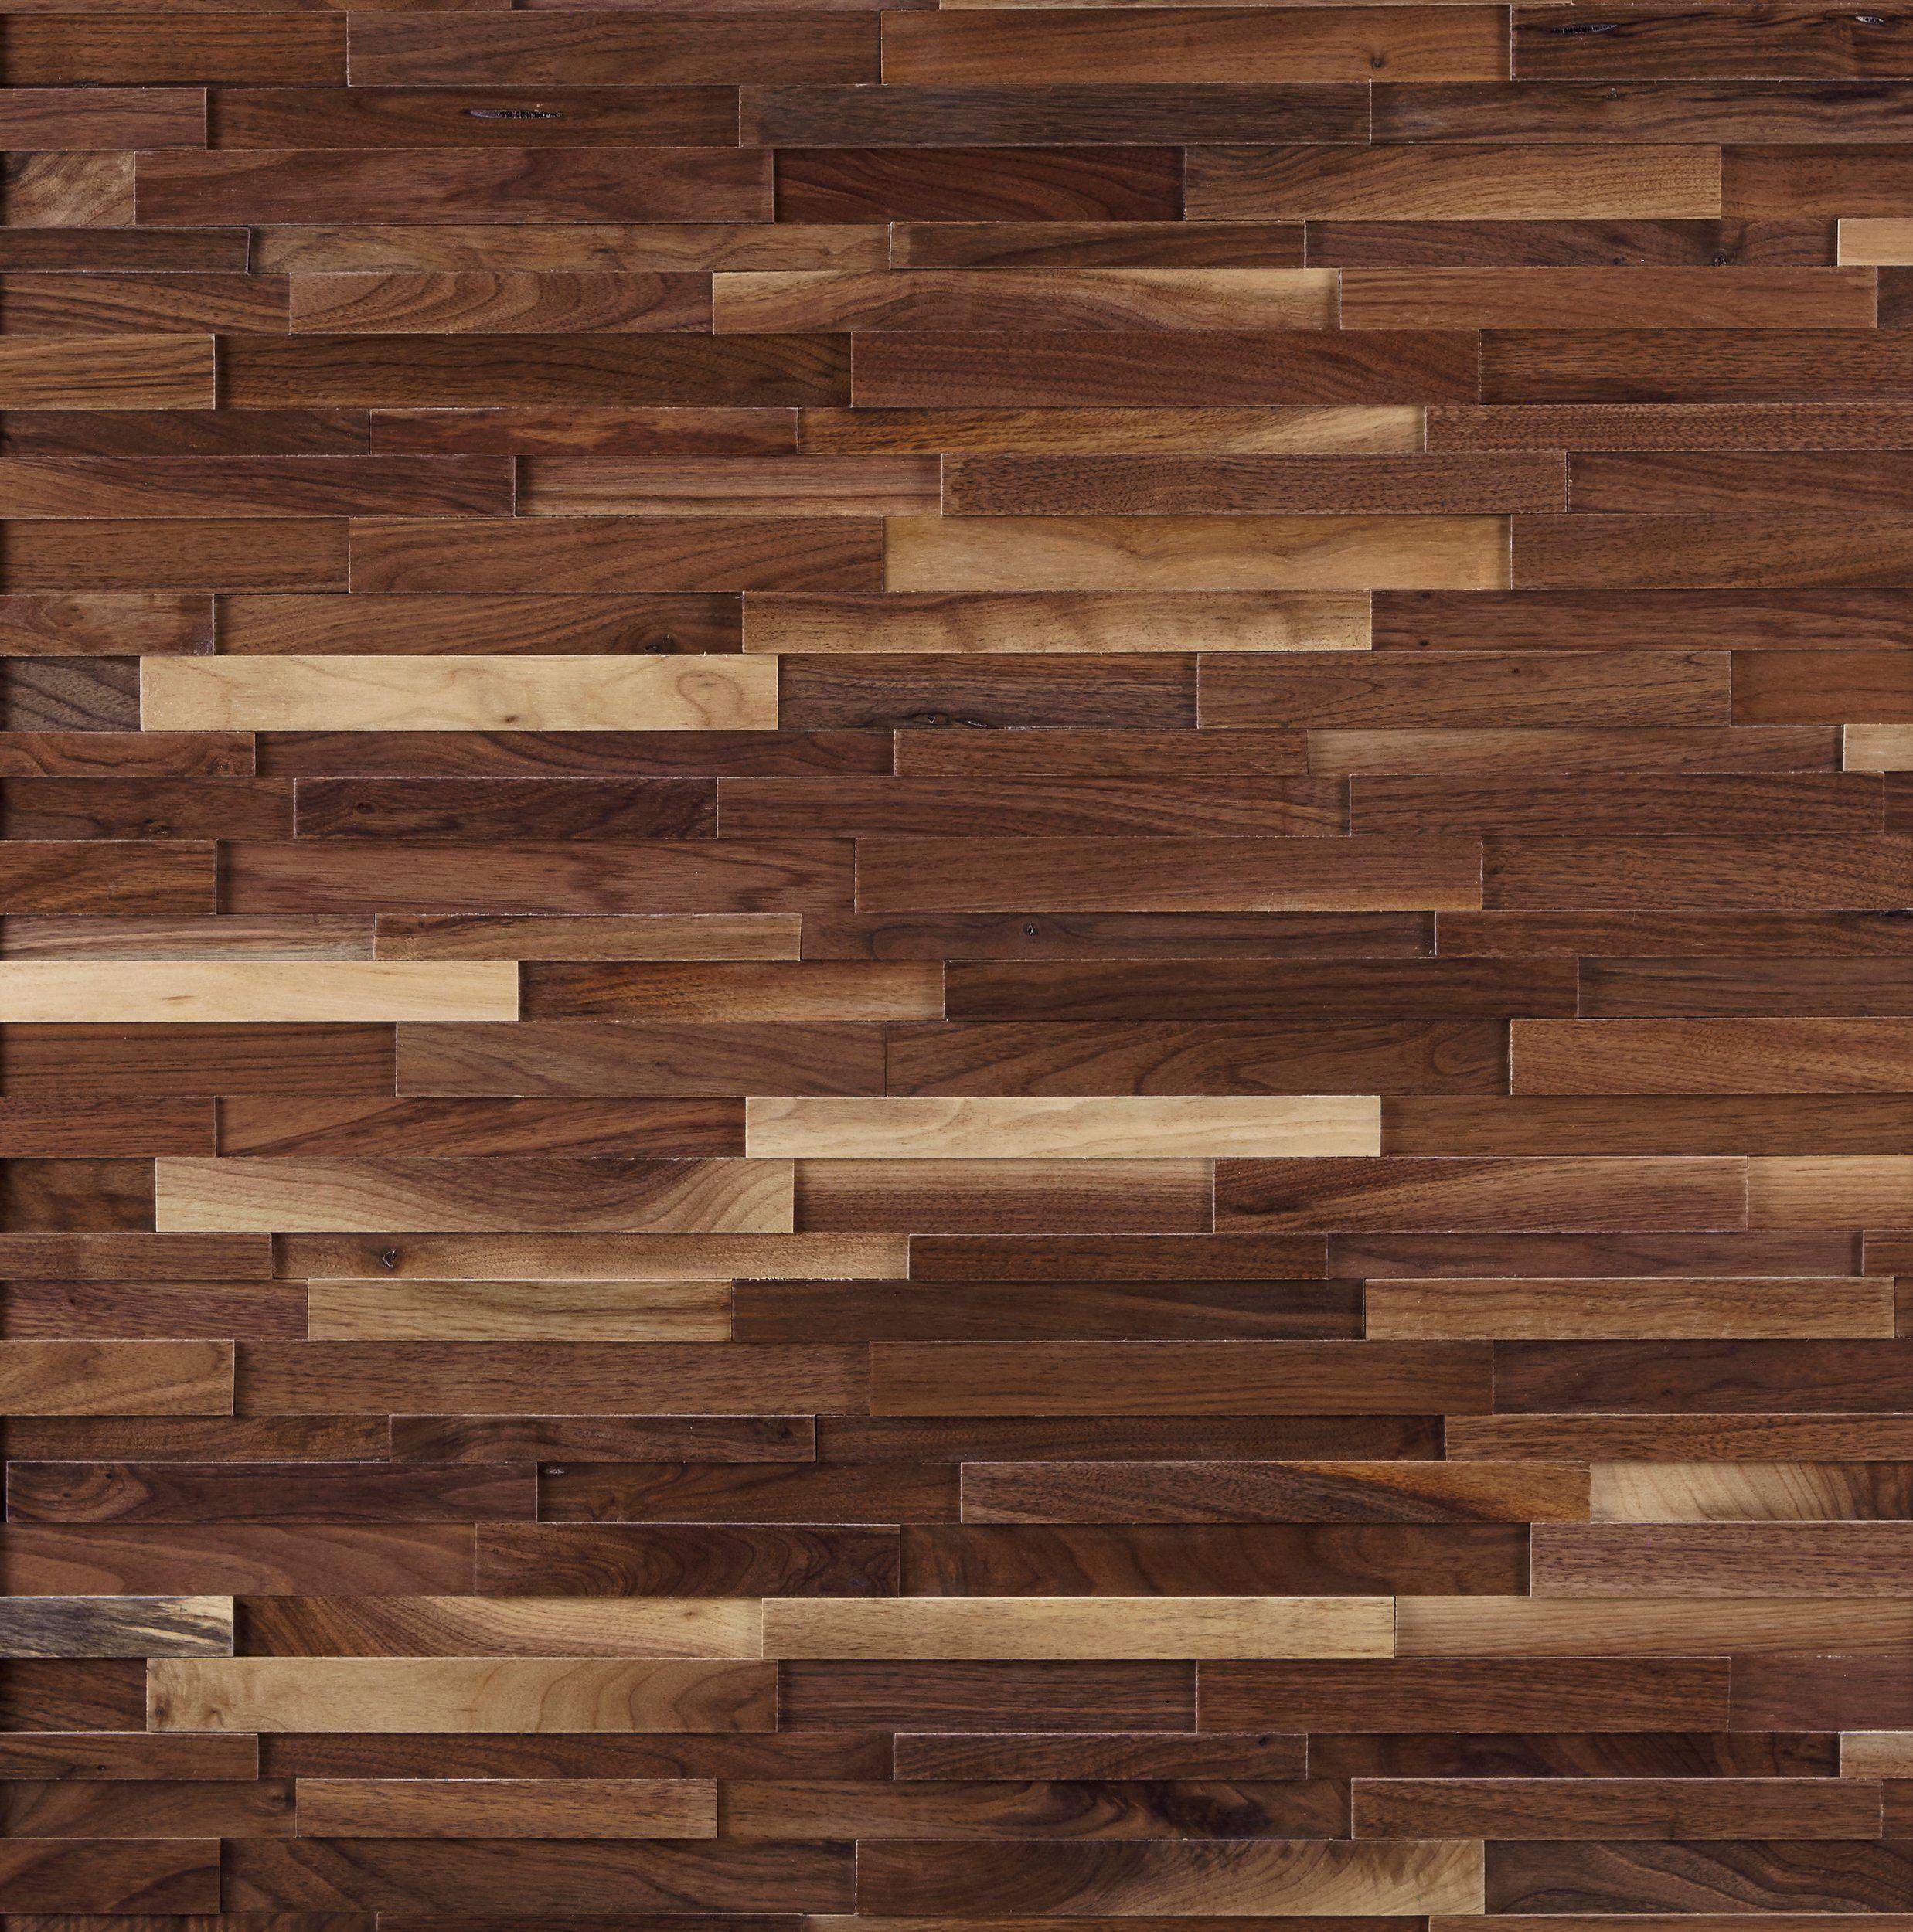 Antique Panel Wood Mosaic Floor Decor Wall Planks Wall Paneling Floor Decor